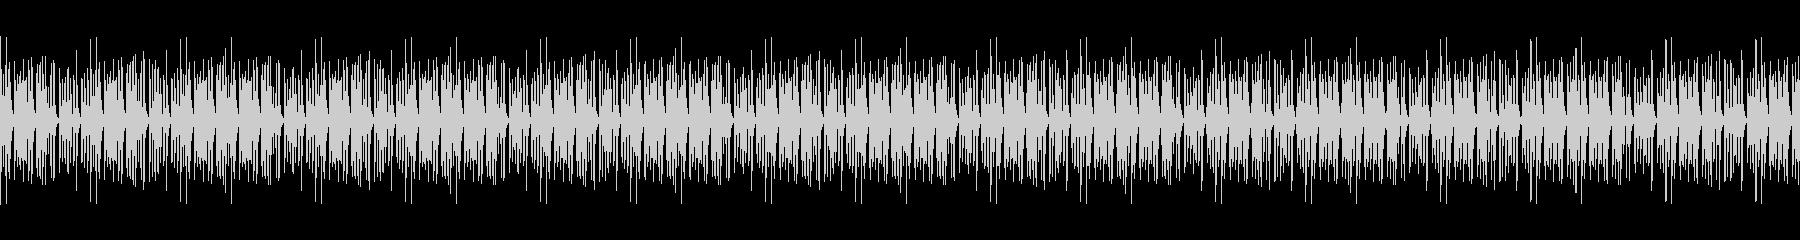 Vtuberの配信 雑談向けBGM 10の未再生の波形